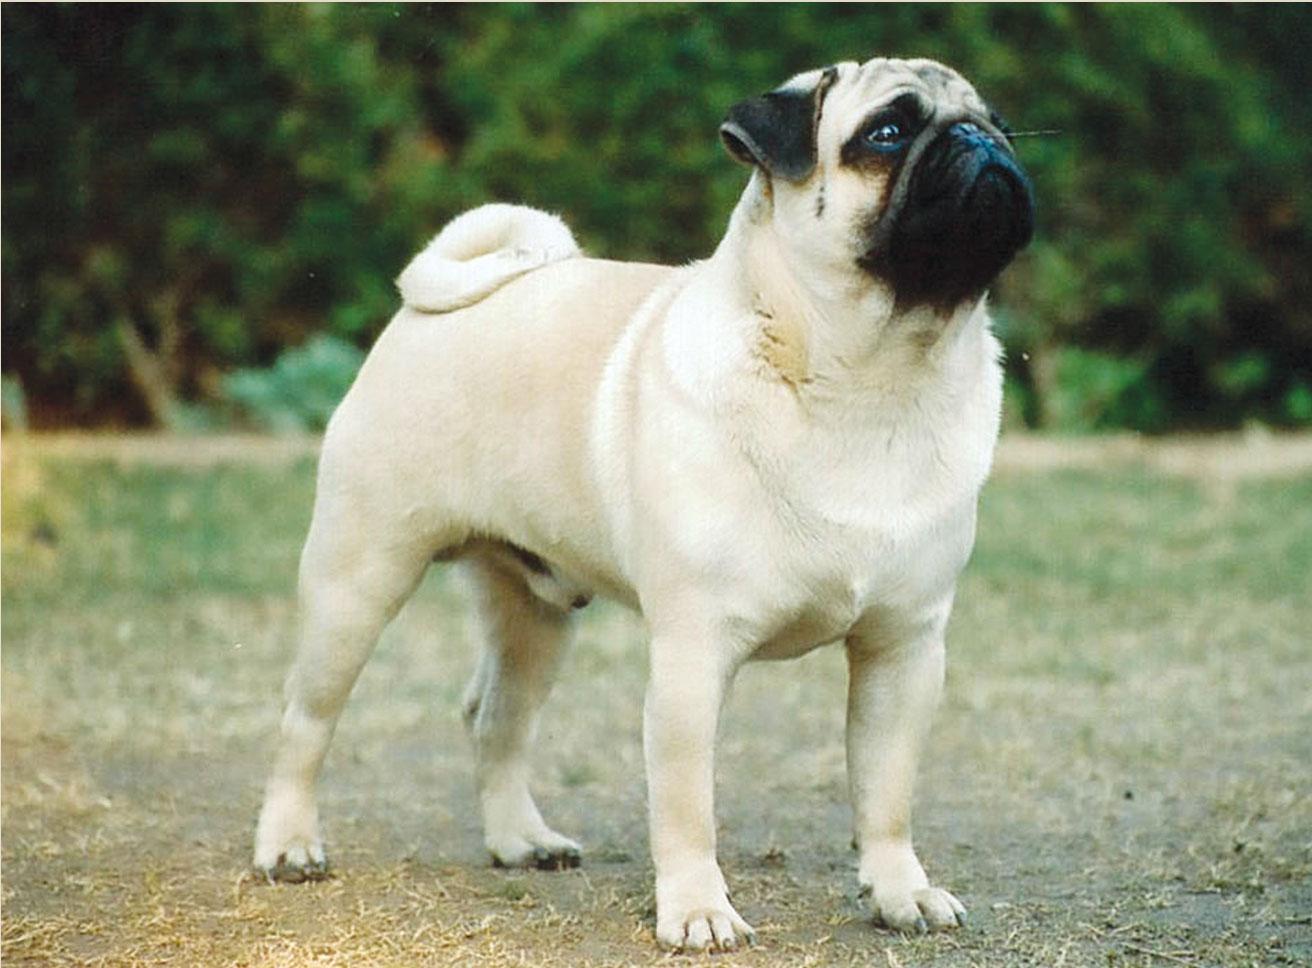 All Wallpapers: Pug Dog Hd Wallpapers